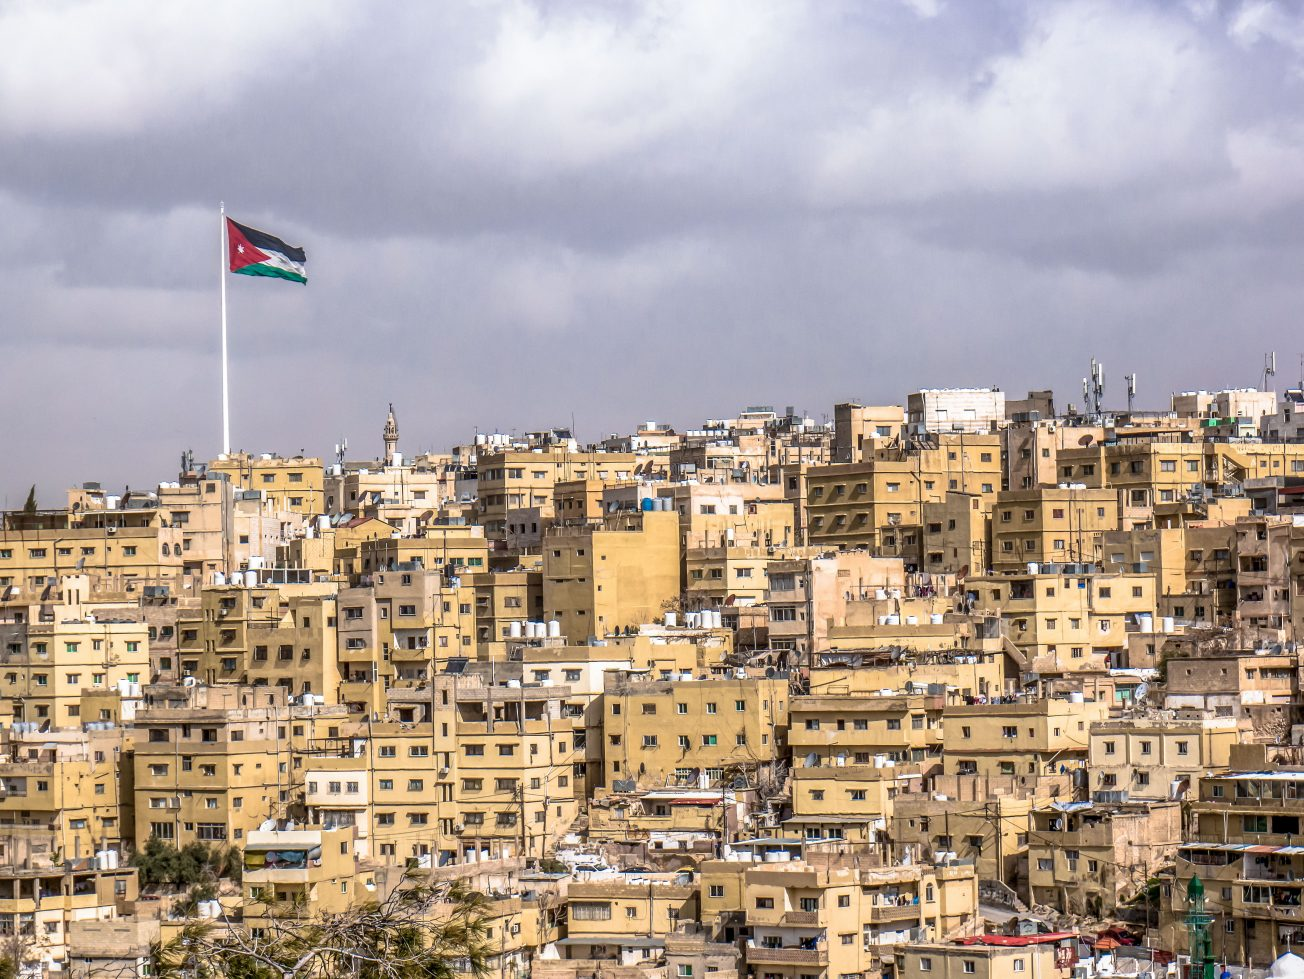 Jordánska vlajka nad Ammanom